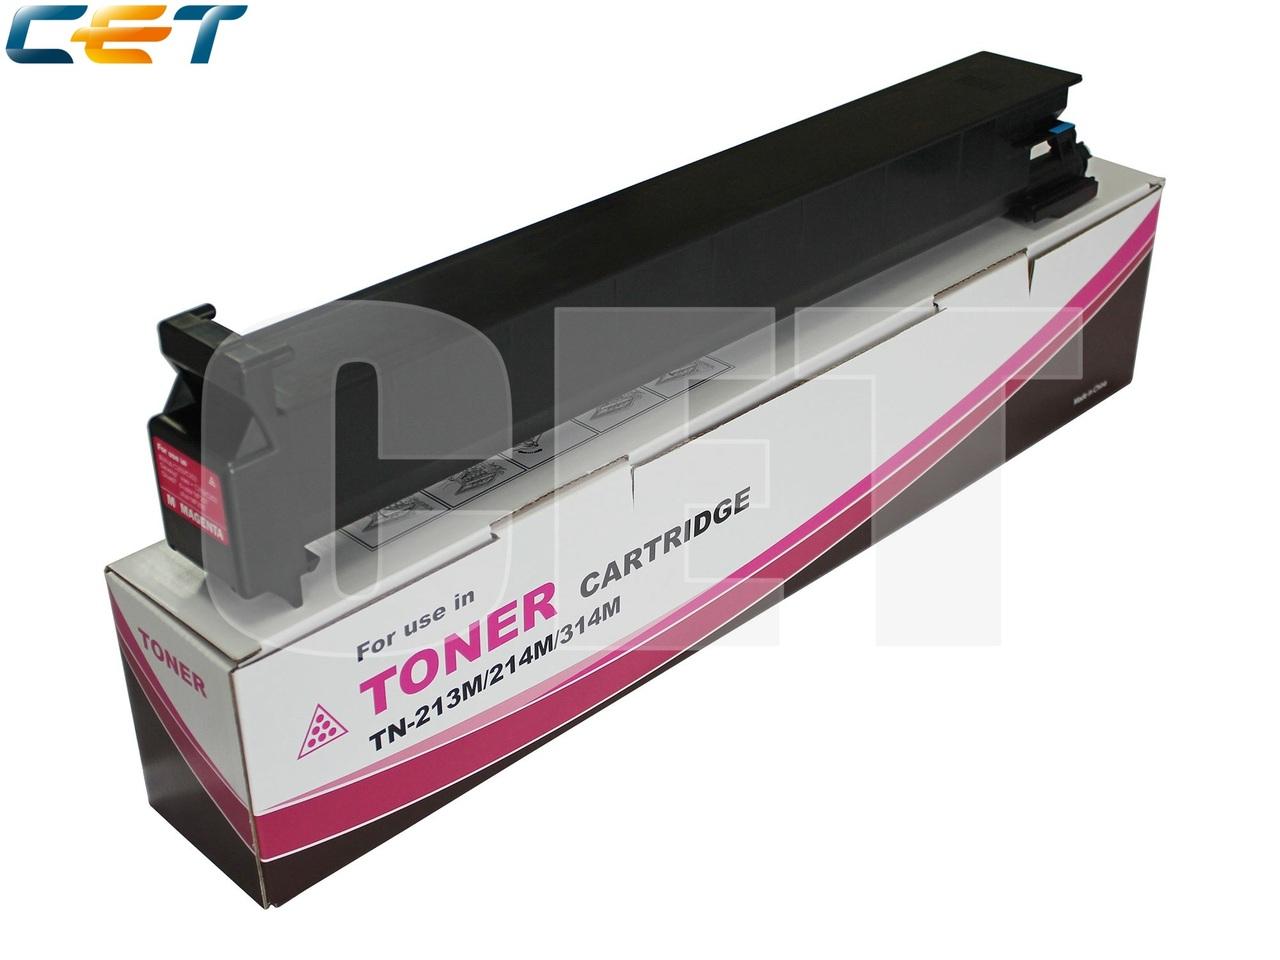 Тонер-картридж TN-213M/214M/314M для KONICA MINOLTABizhub C200/C203/C253/C353 (CET) Magenta, 360г, 20000 стр.,CET6803